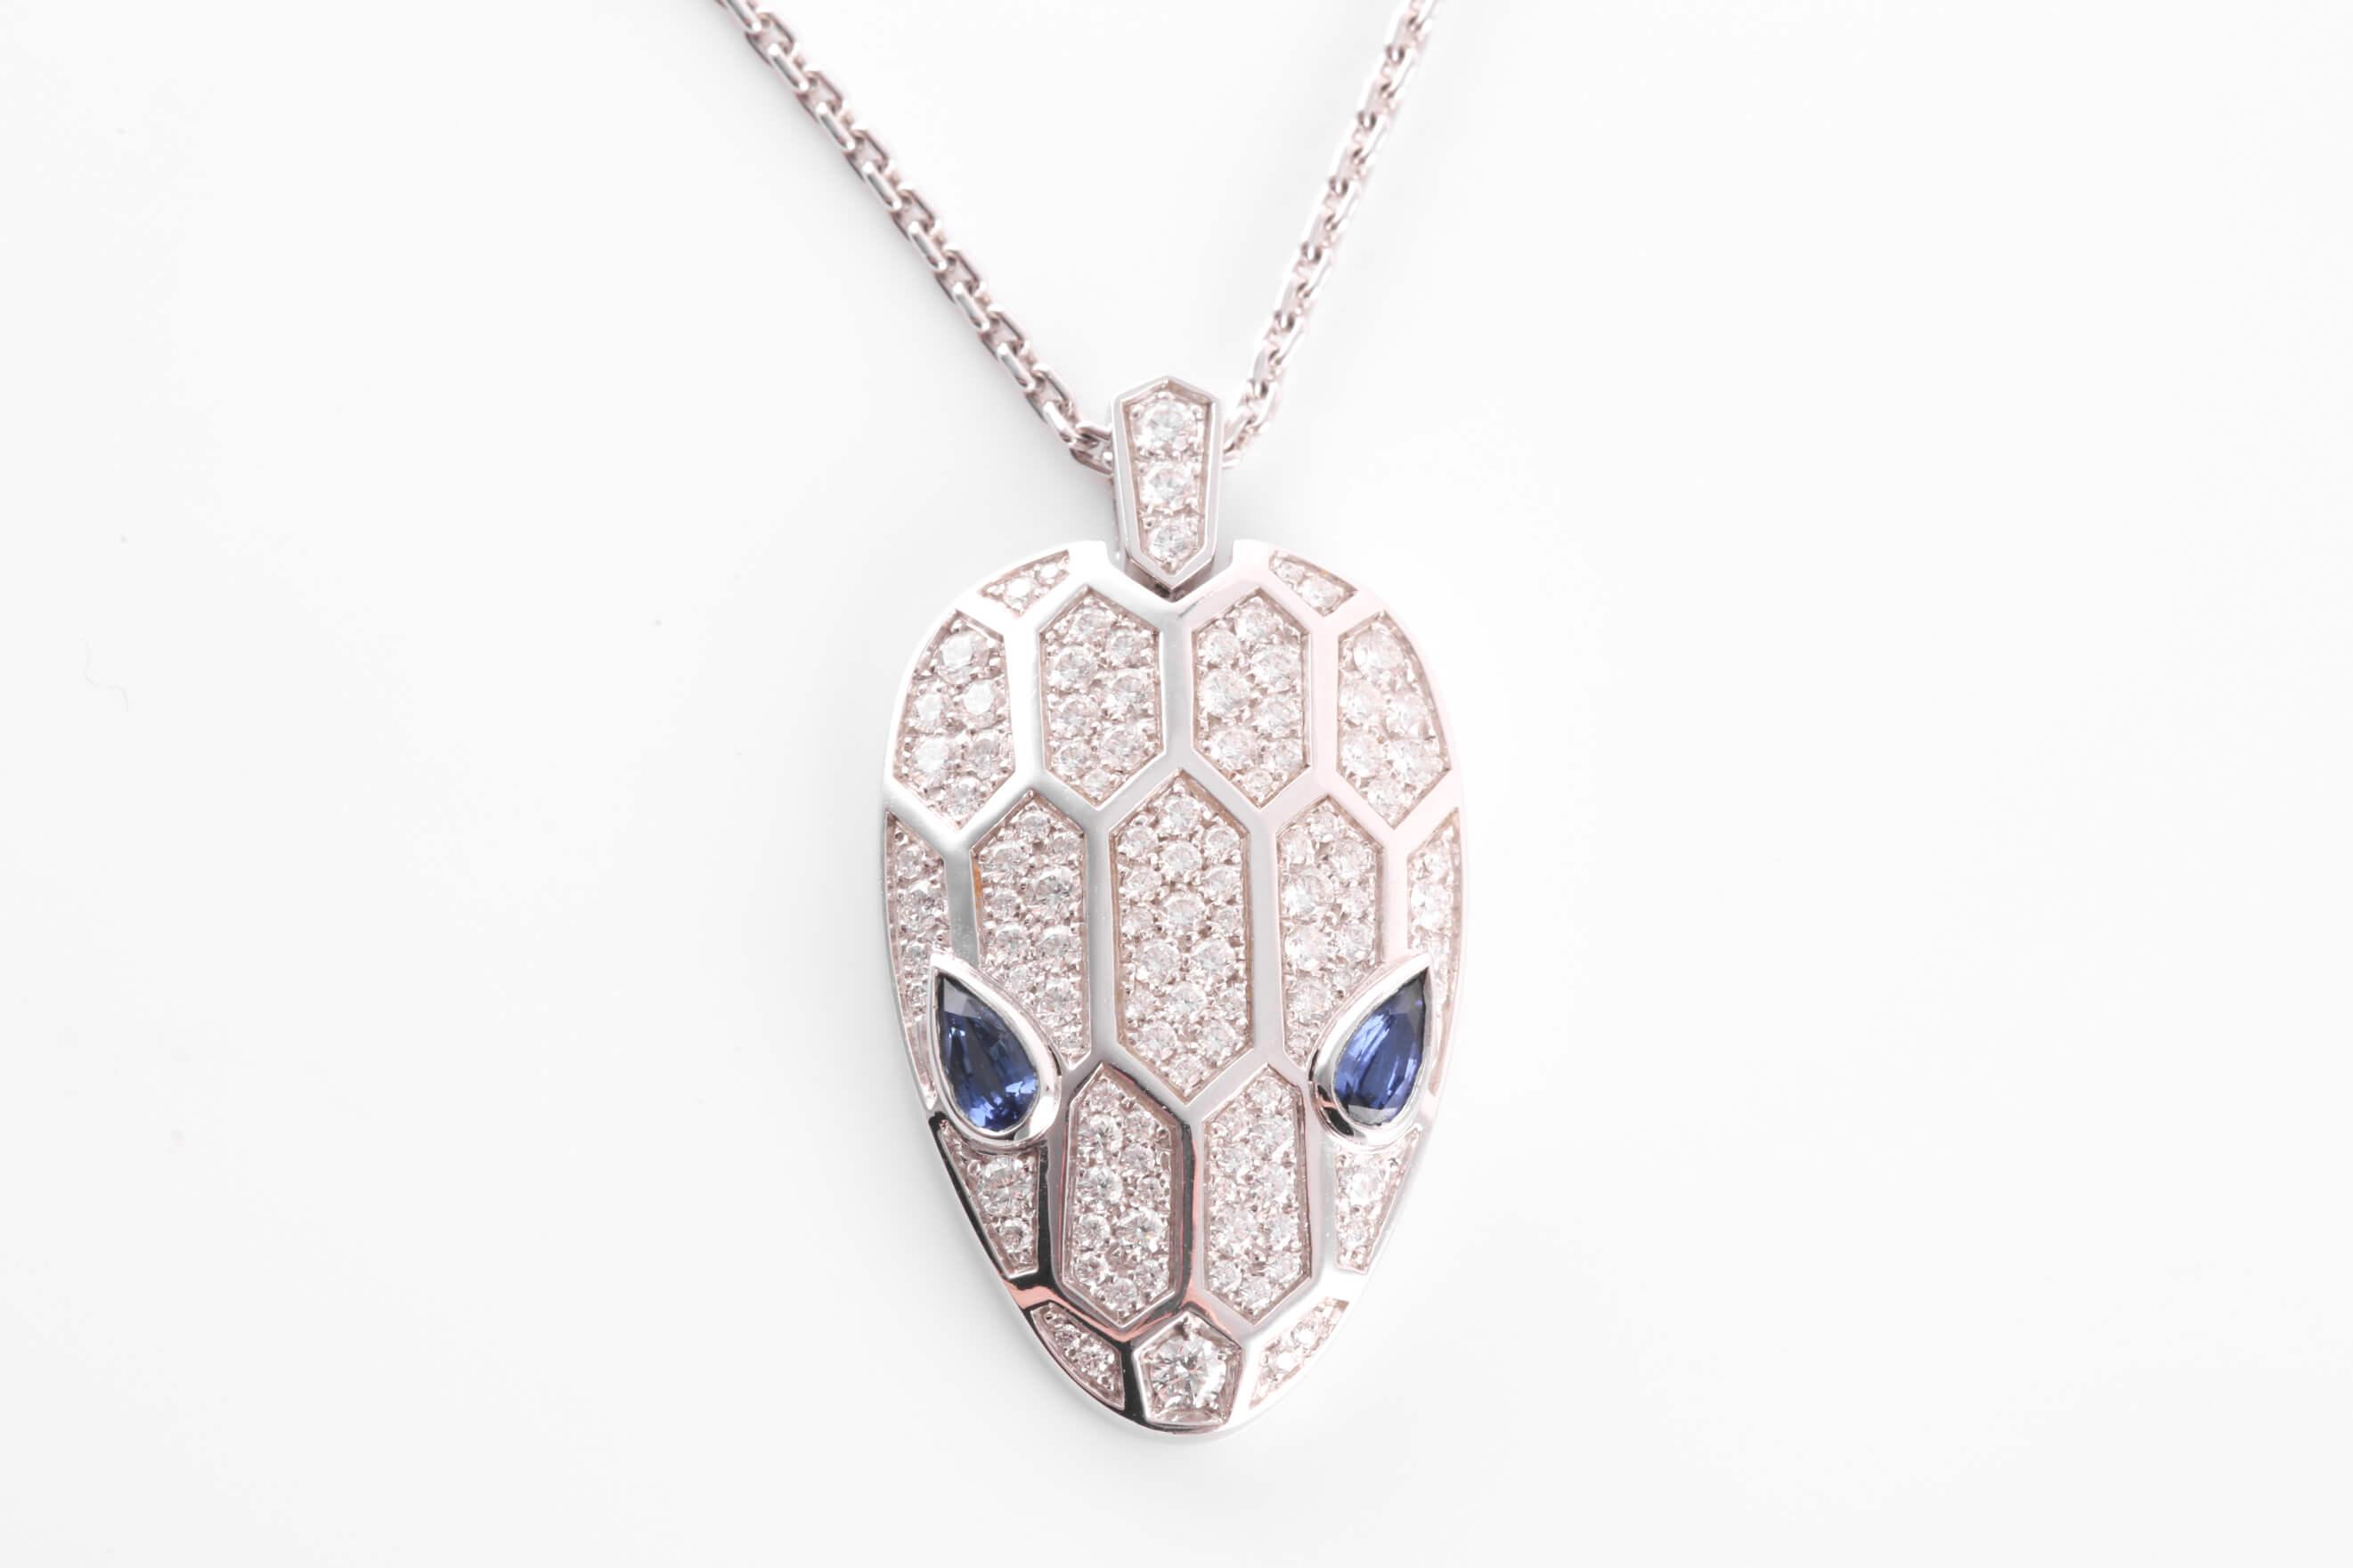 Bulgari 18 carat white gold, sapphire and diamond Serpenti necklace